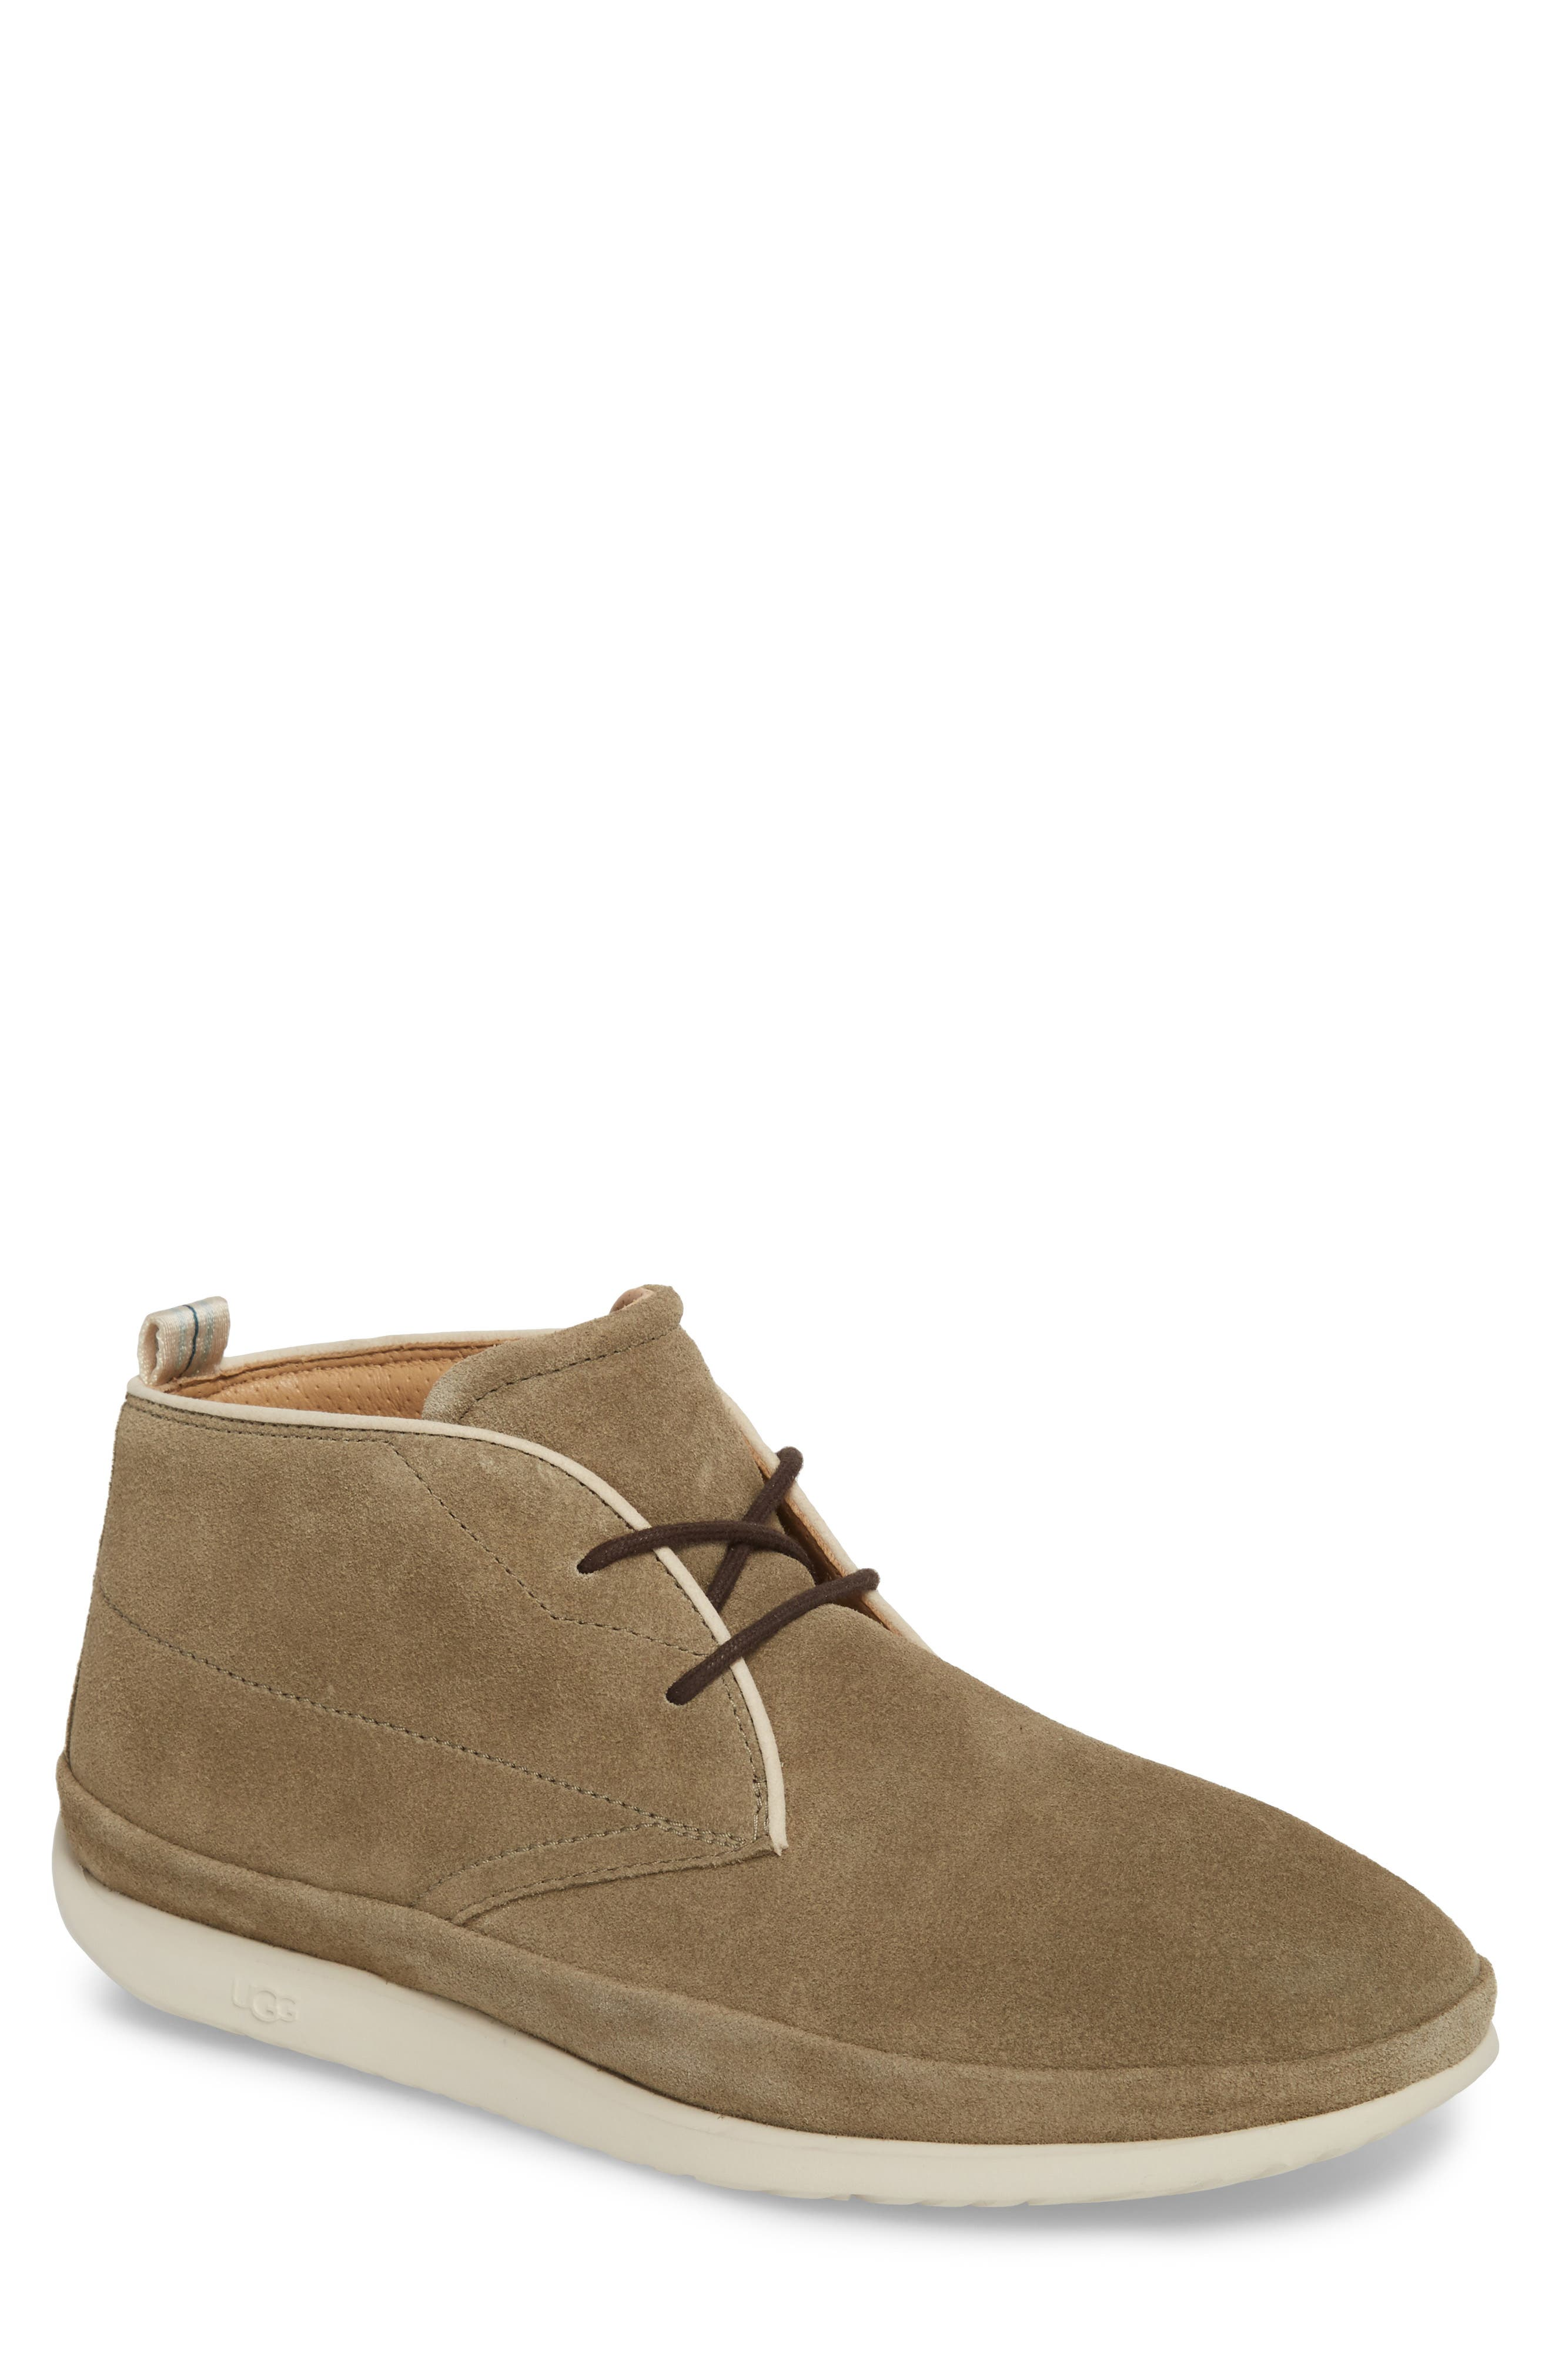 Cali Chukka Boot,                             Main thumbnail 1, color,                             Antilope Leather